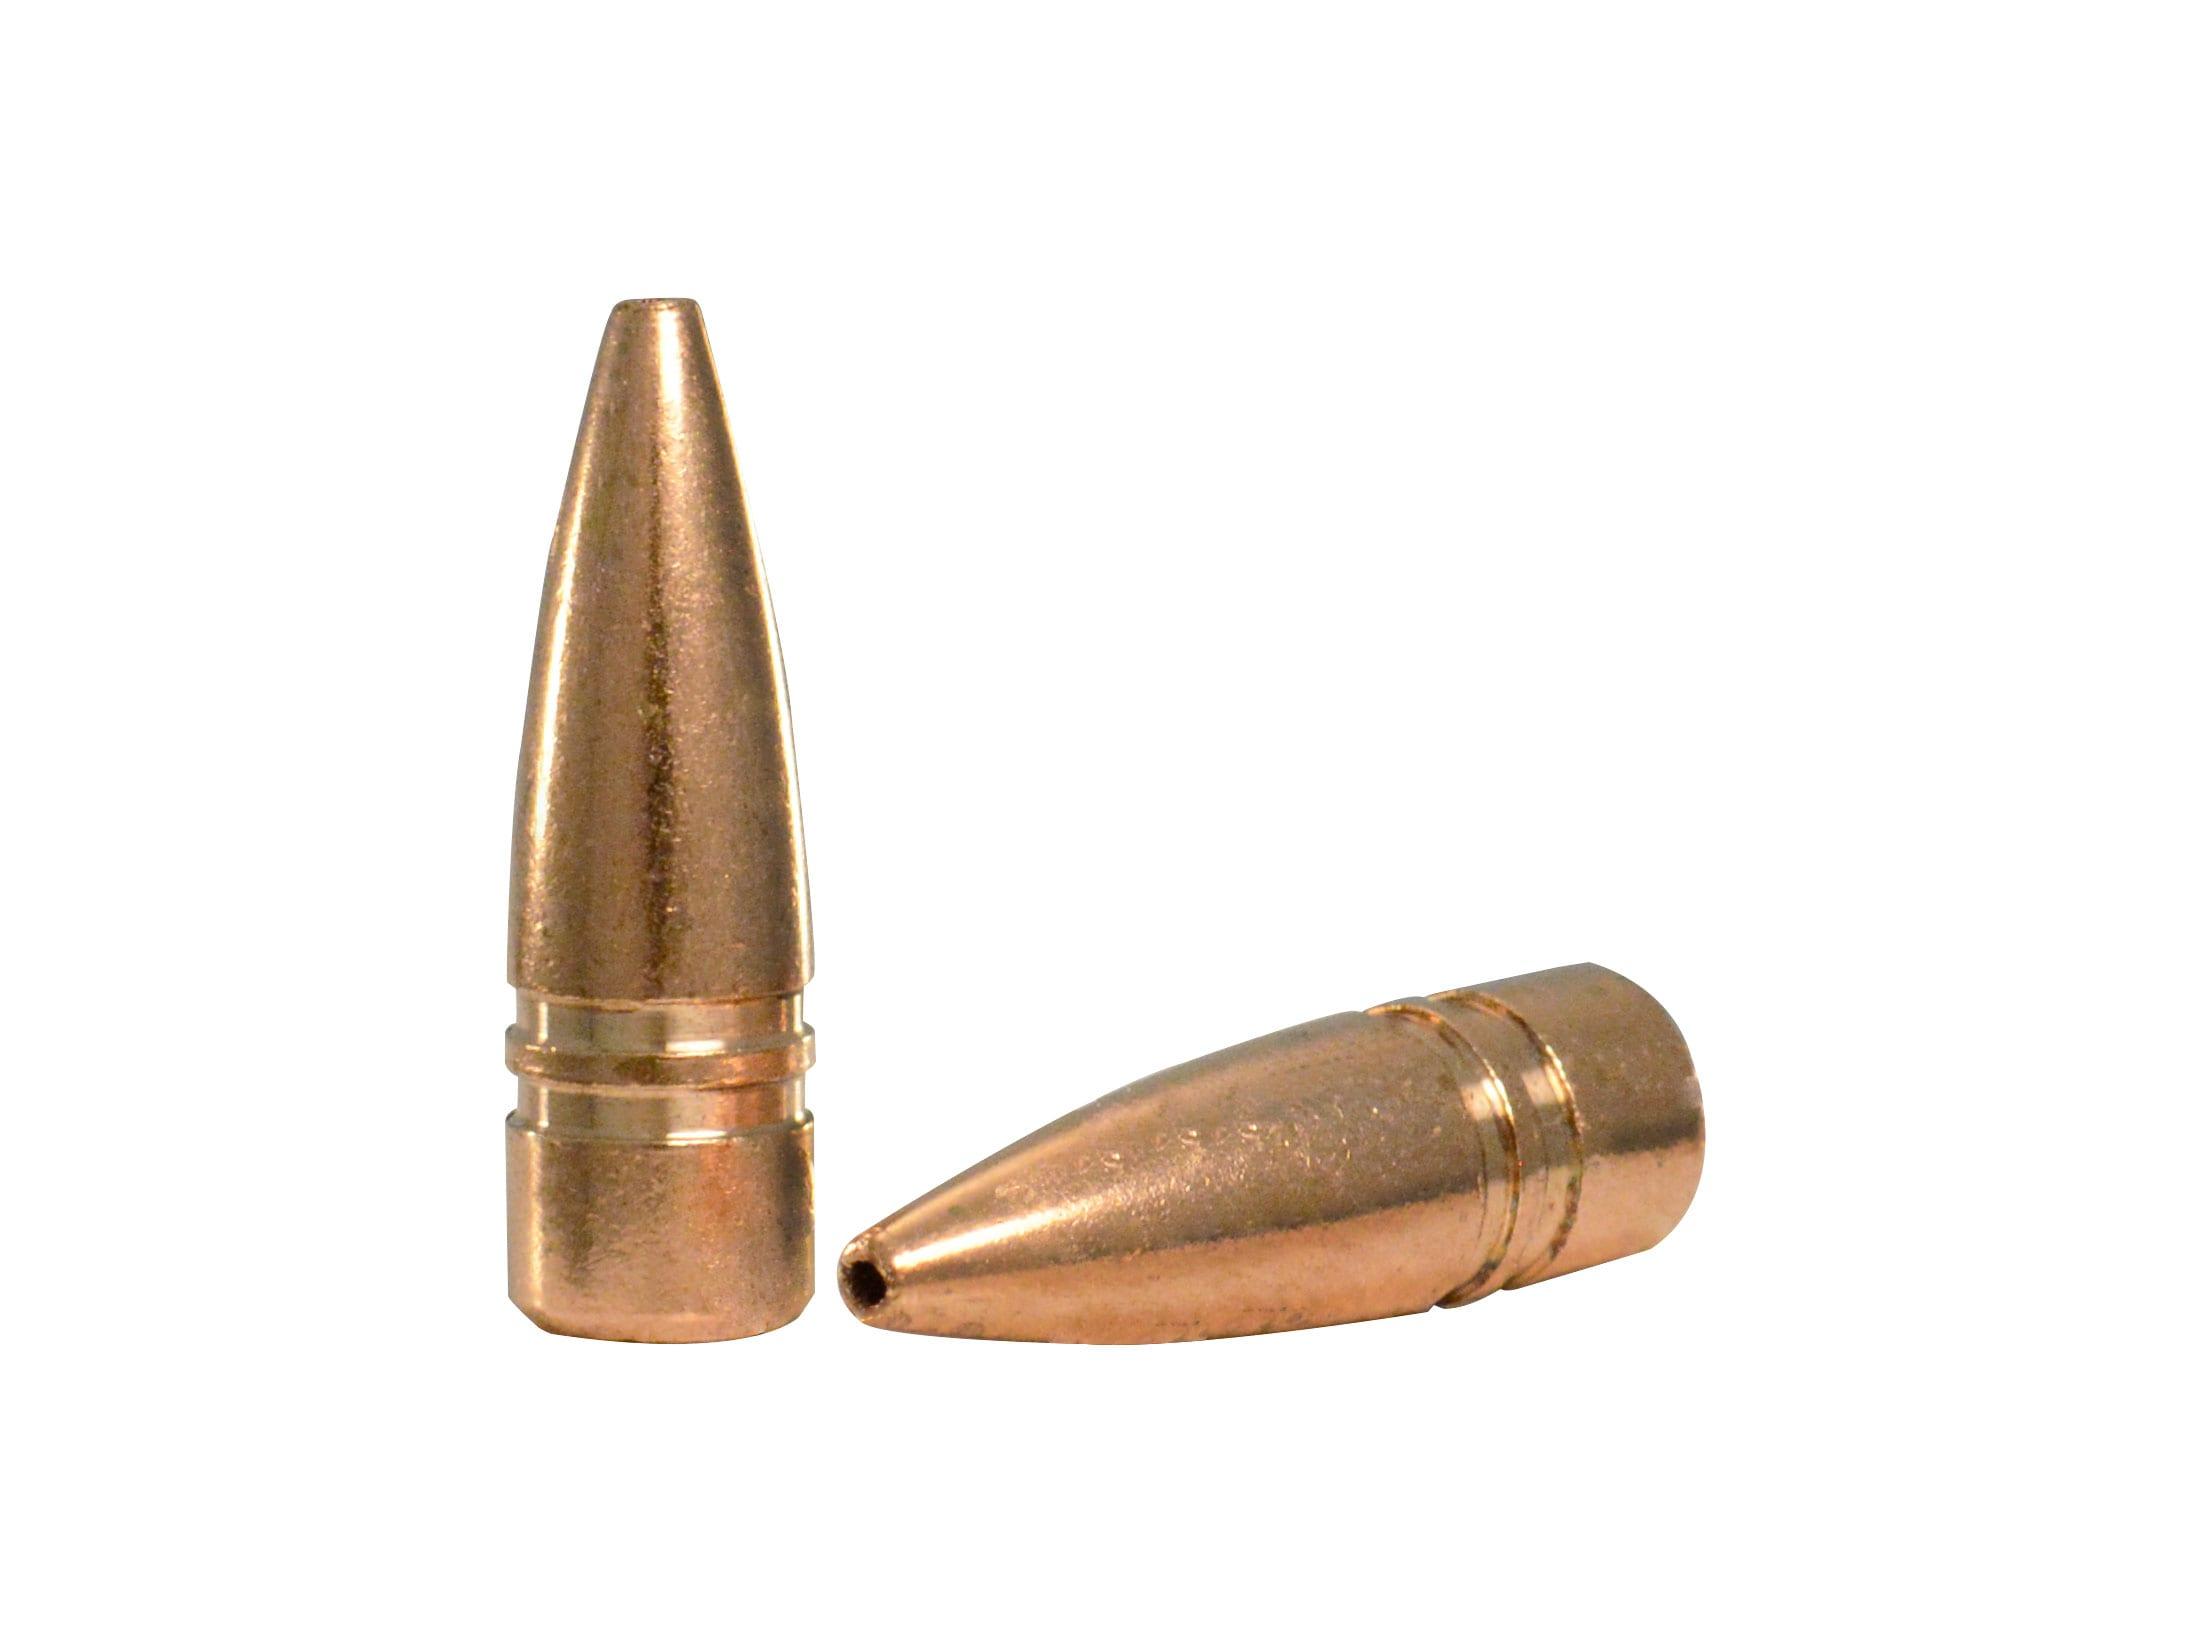 Federal Bullets 7 62x51mm NATO (308 Diameter) MK319 MOD 0 SOST 130